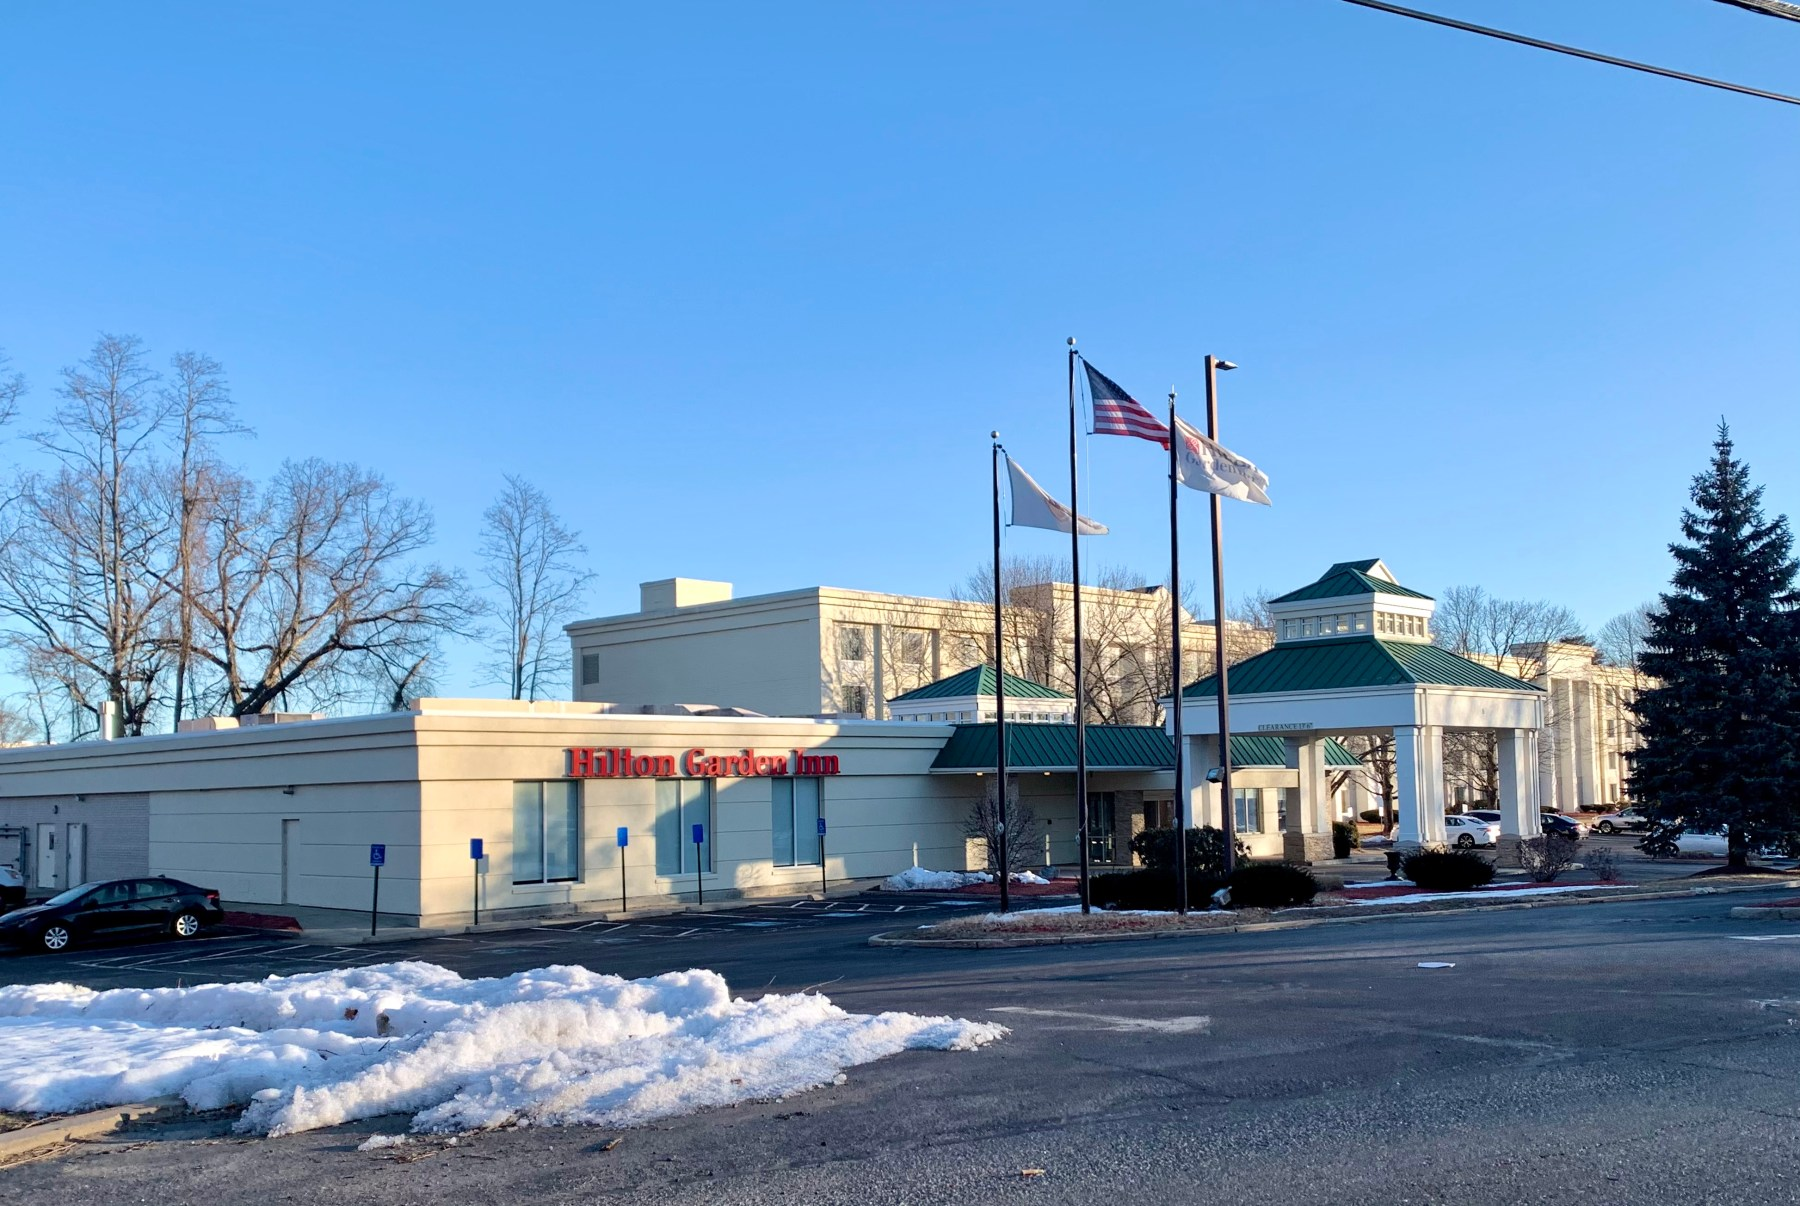 Hilton Garden Inn, 5 Wheeler Road, Burlington MA